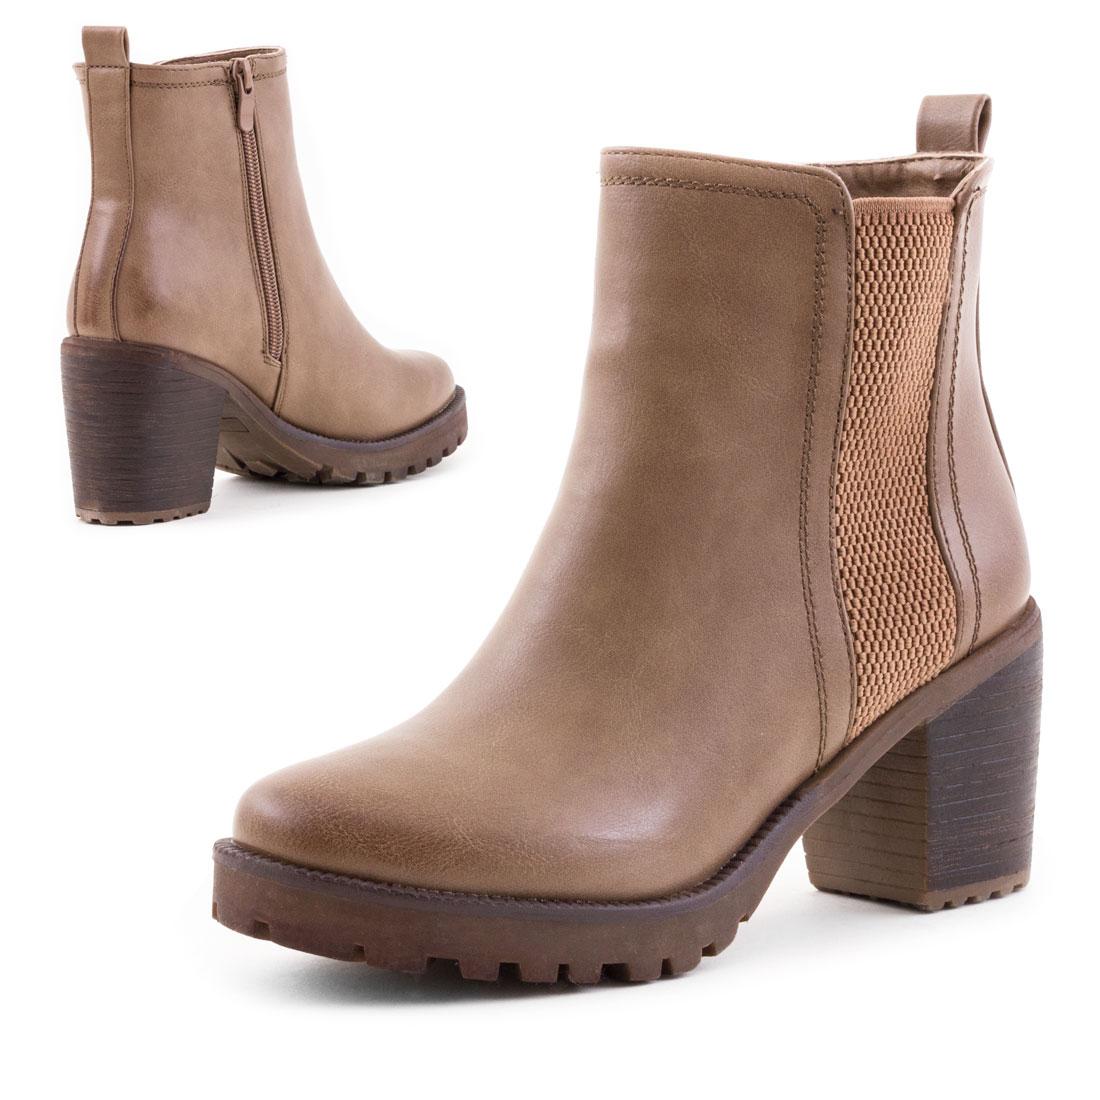 neu damen blockabsatz ankle boots profilsohle schuhe gr 36. Black Bedroom Furniture Sets. Home Design Ideas